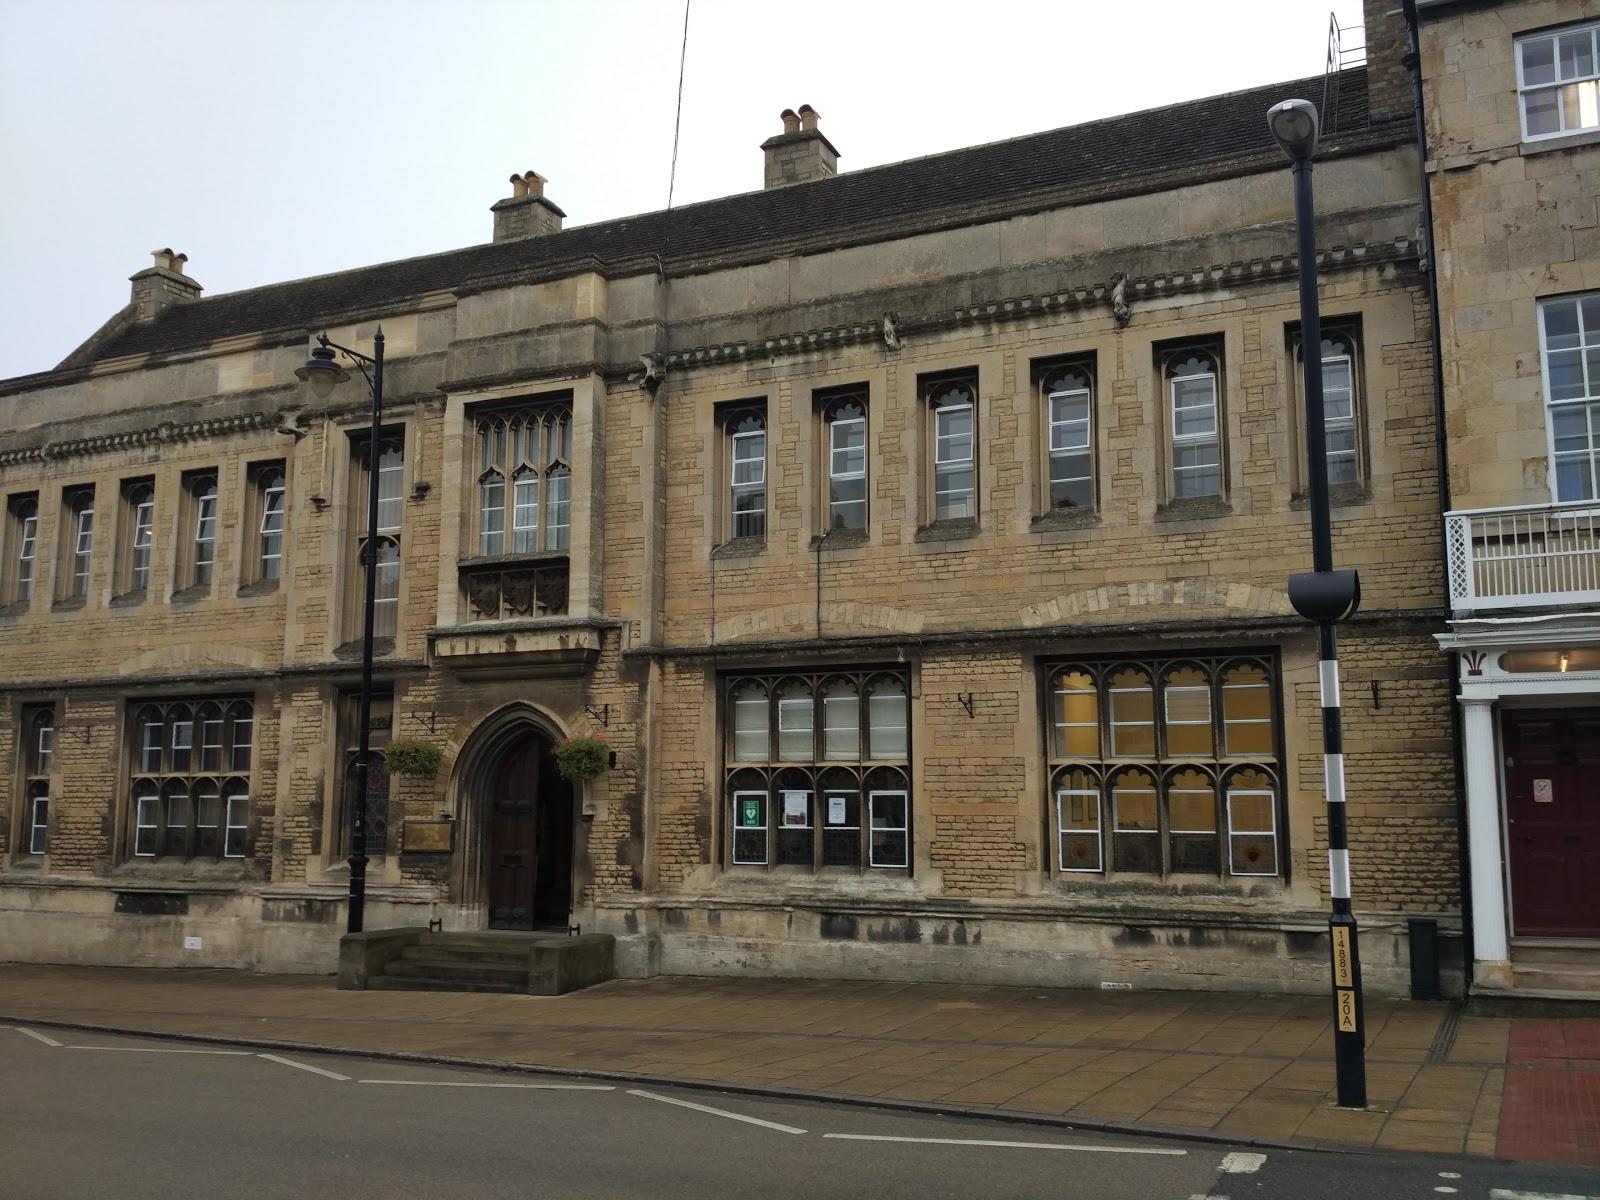 Stamford Endowed School for Girls